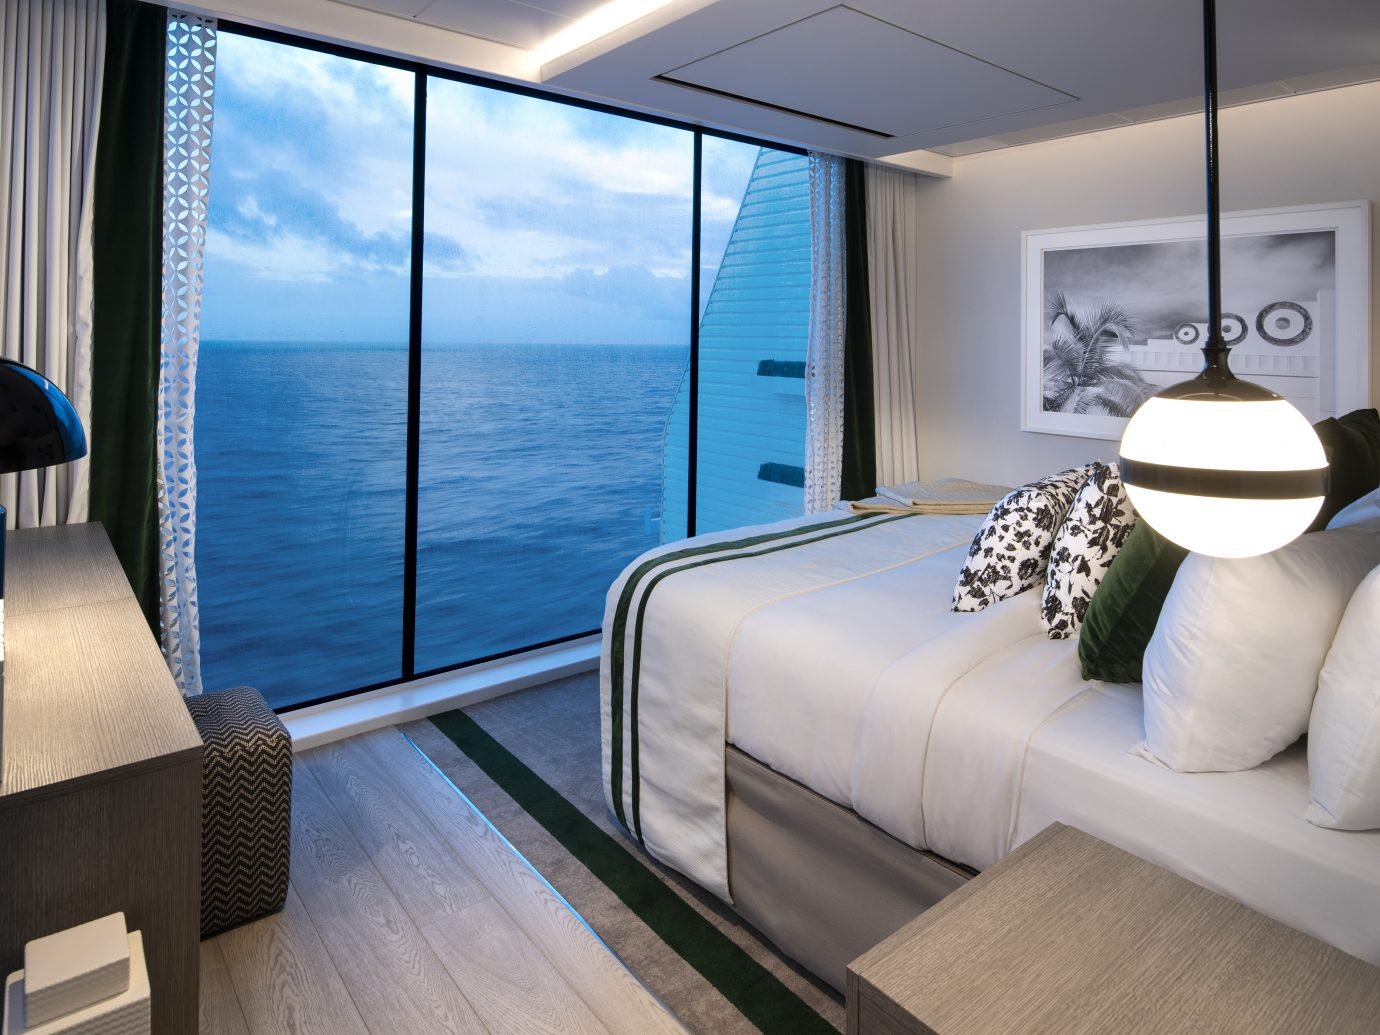 Bedroom of Edge Villa at Celebrity Cruises